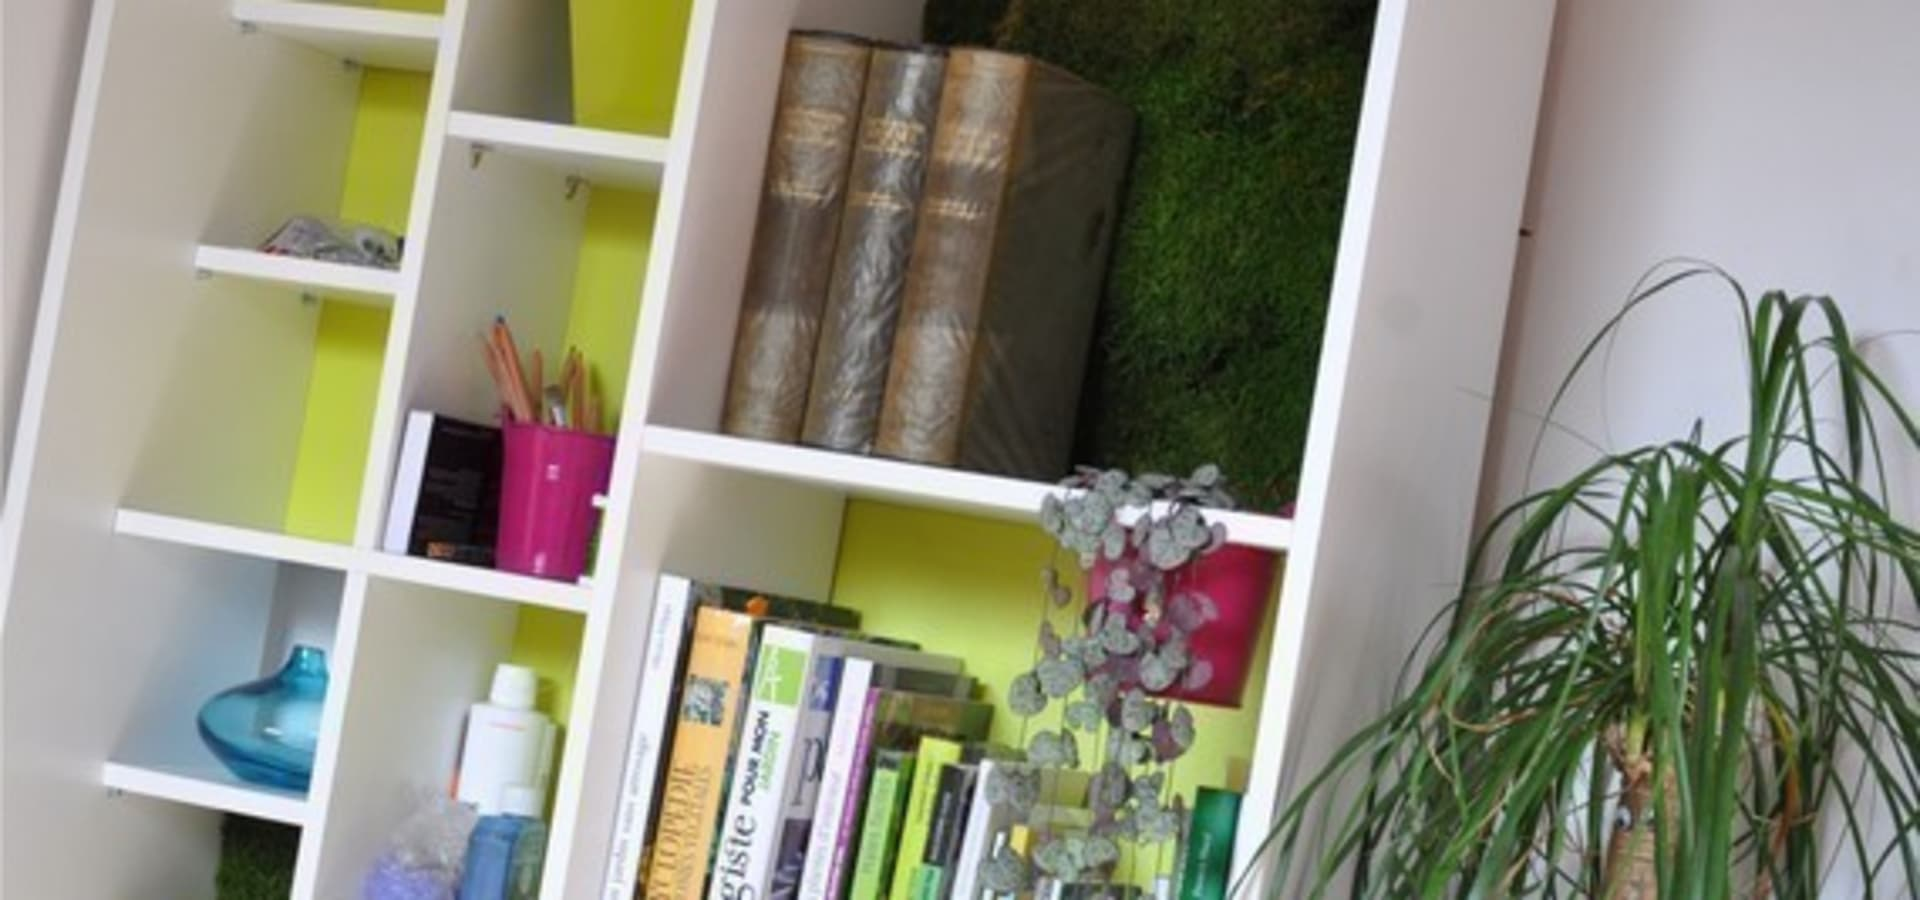 Evo green design